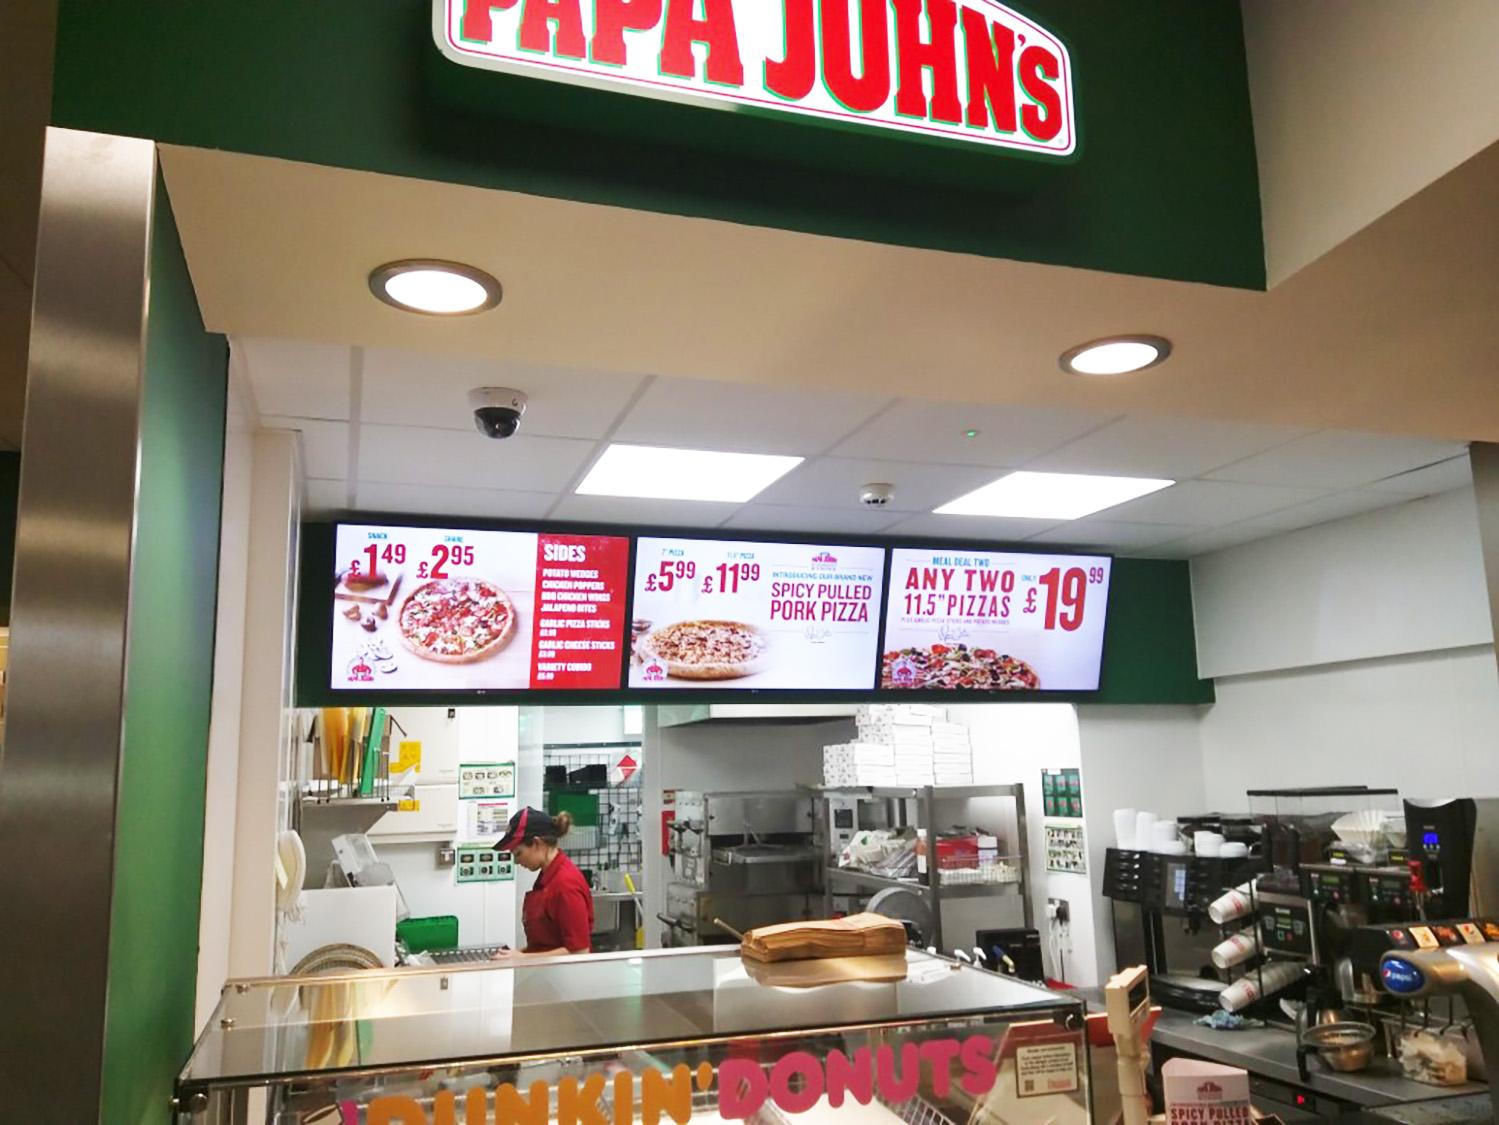 Digital menu boards fast food restaurants – Papa Johns exterior signage